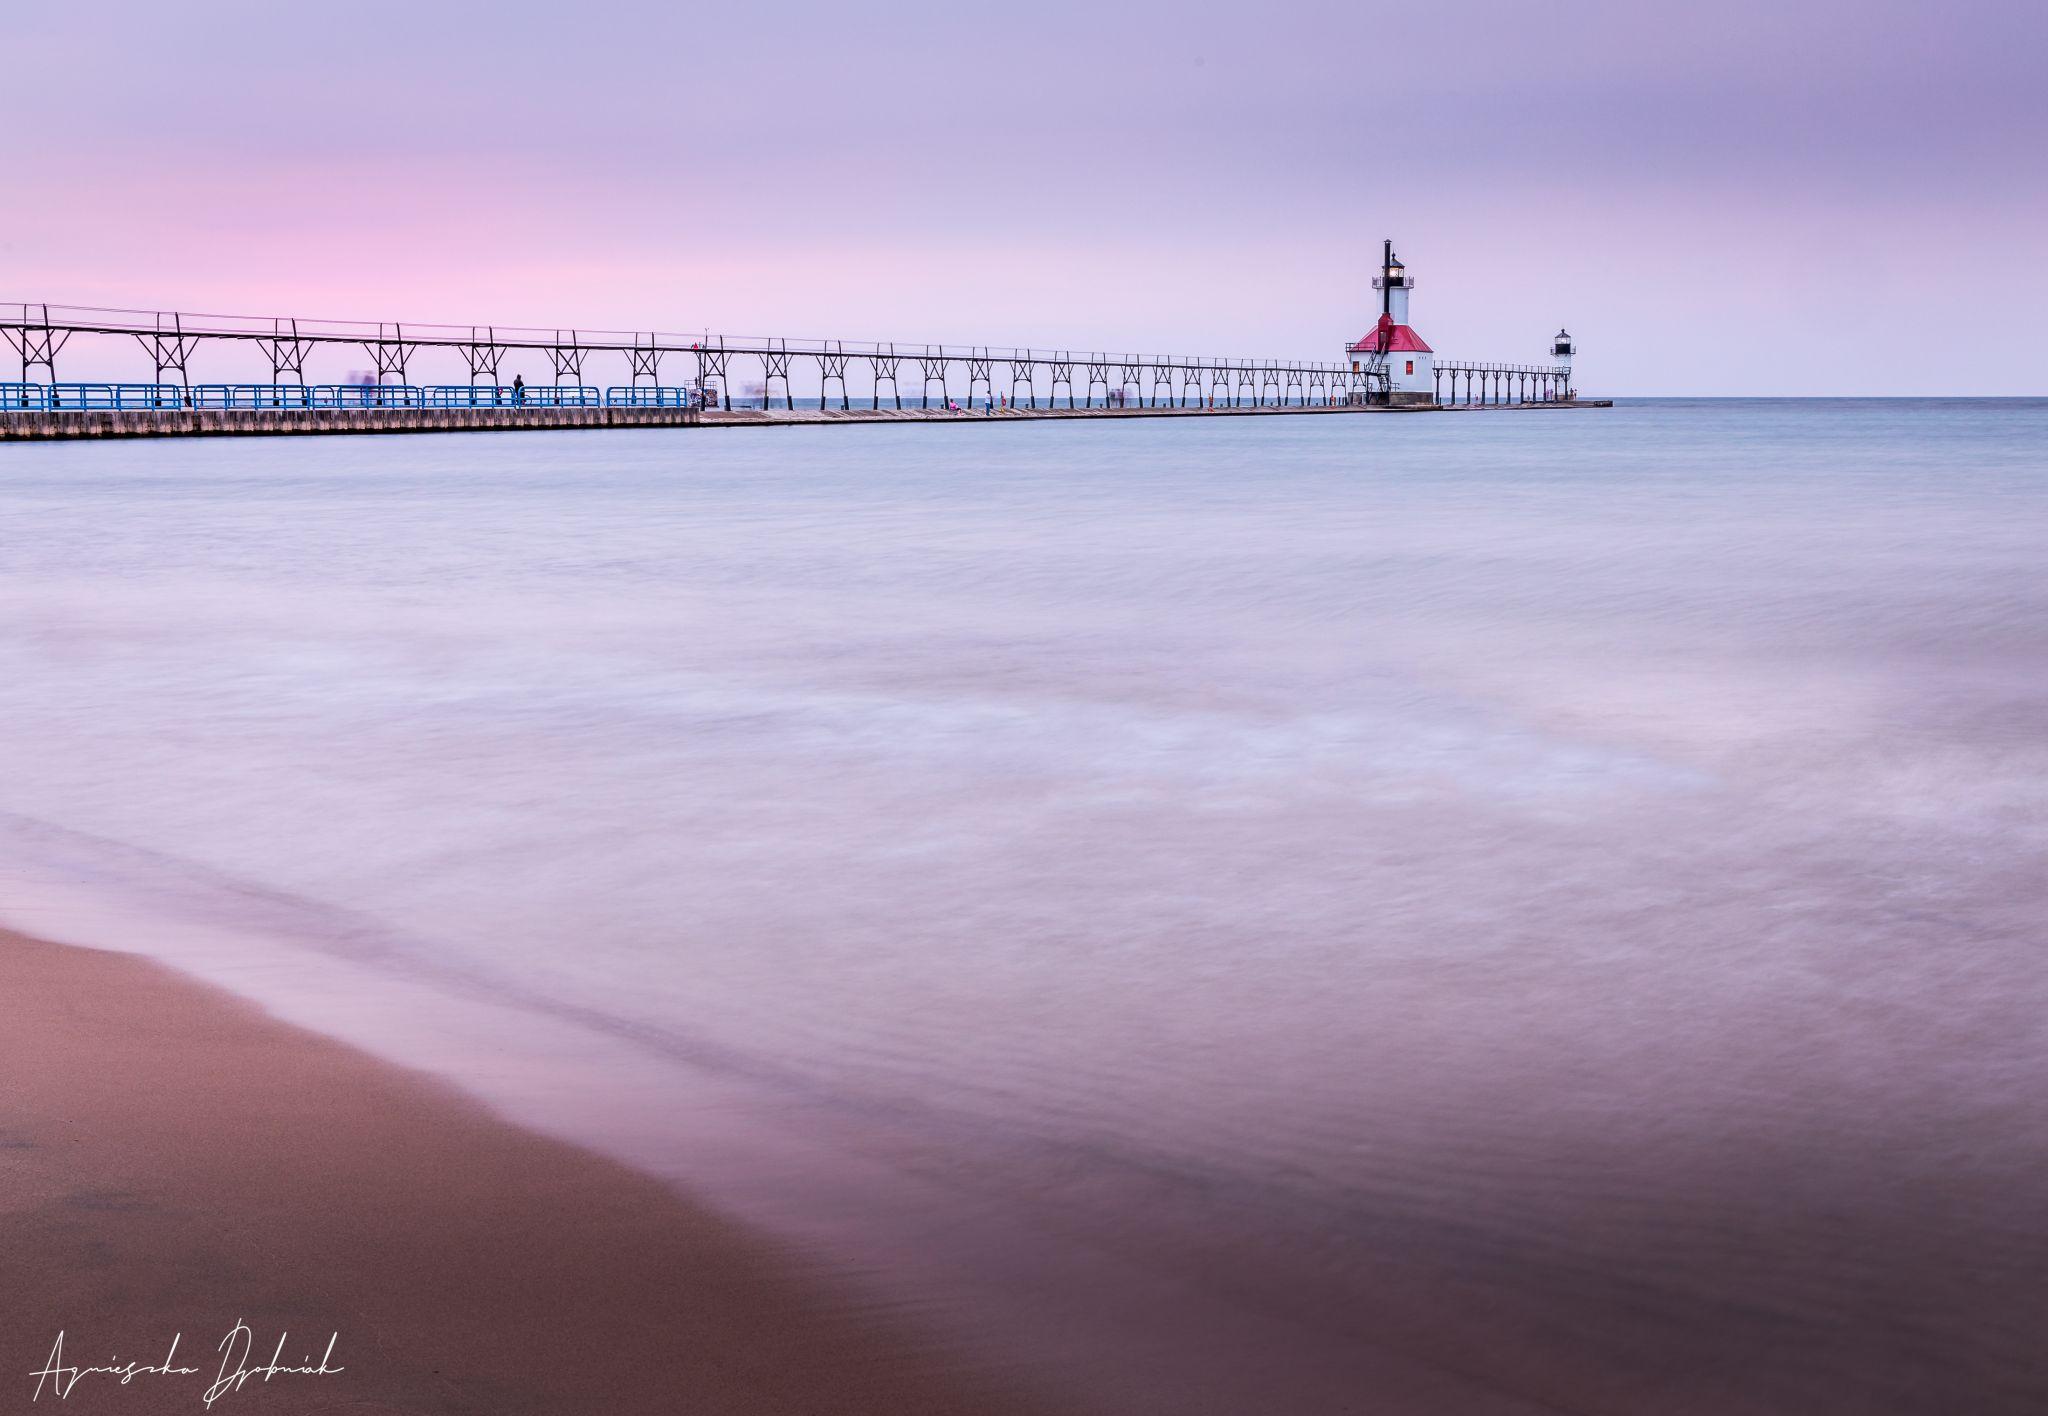 St. Joseph North Pier Outer Lighthouse, Michigan., USA